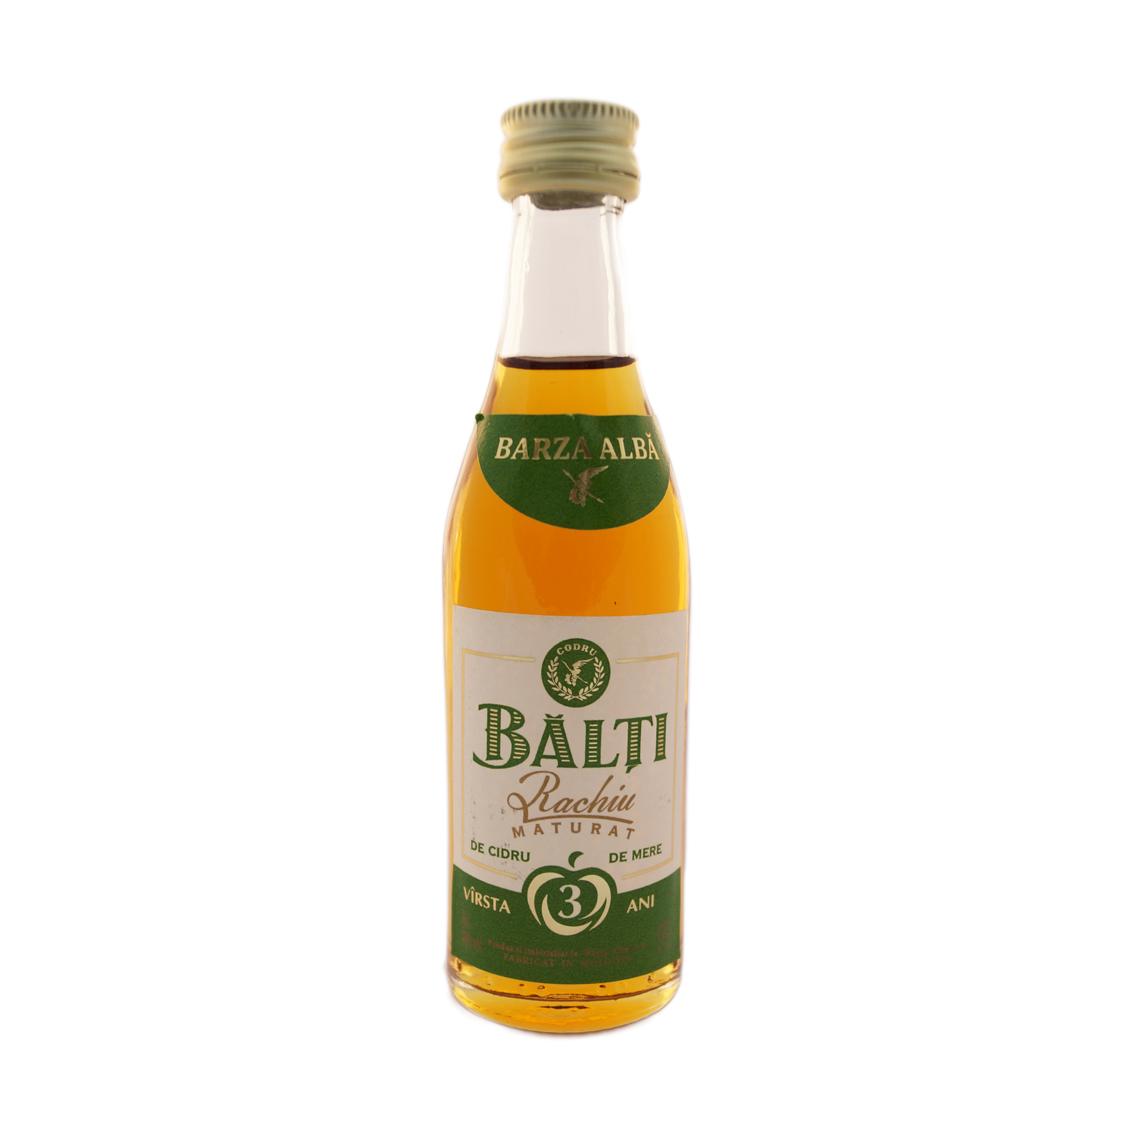 BRANDY-DIVIN-BALTI-3-STAR